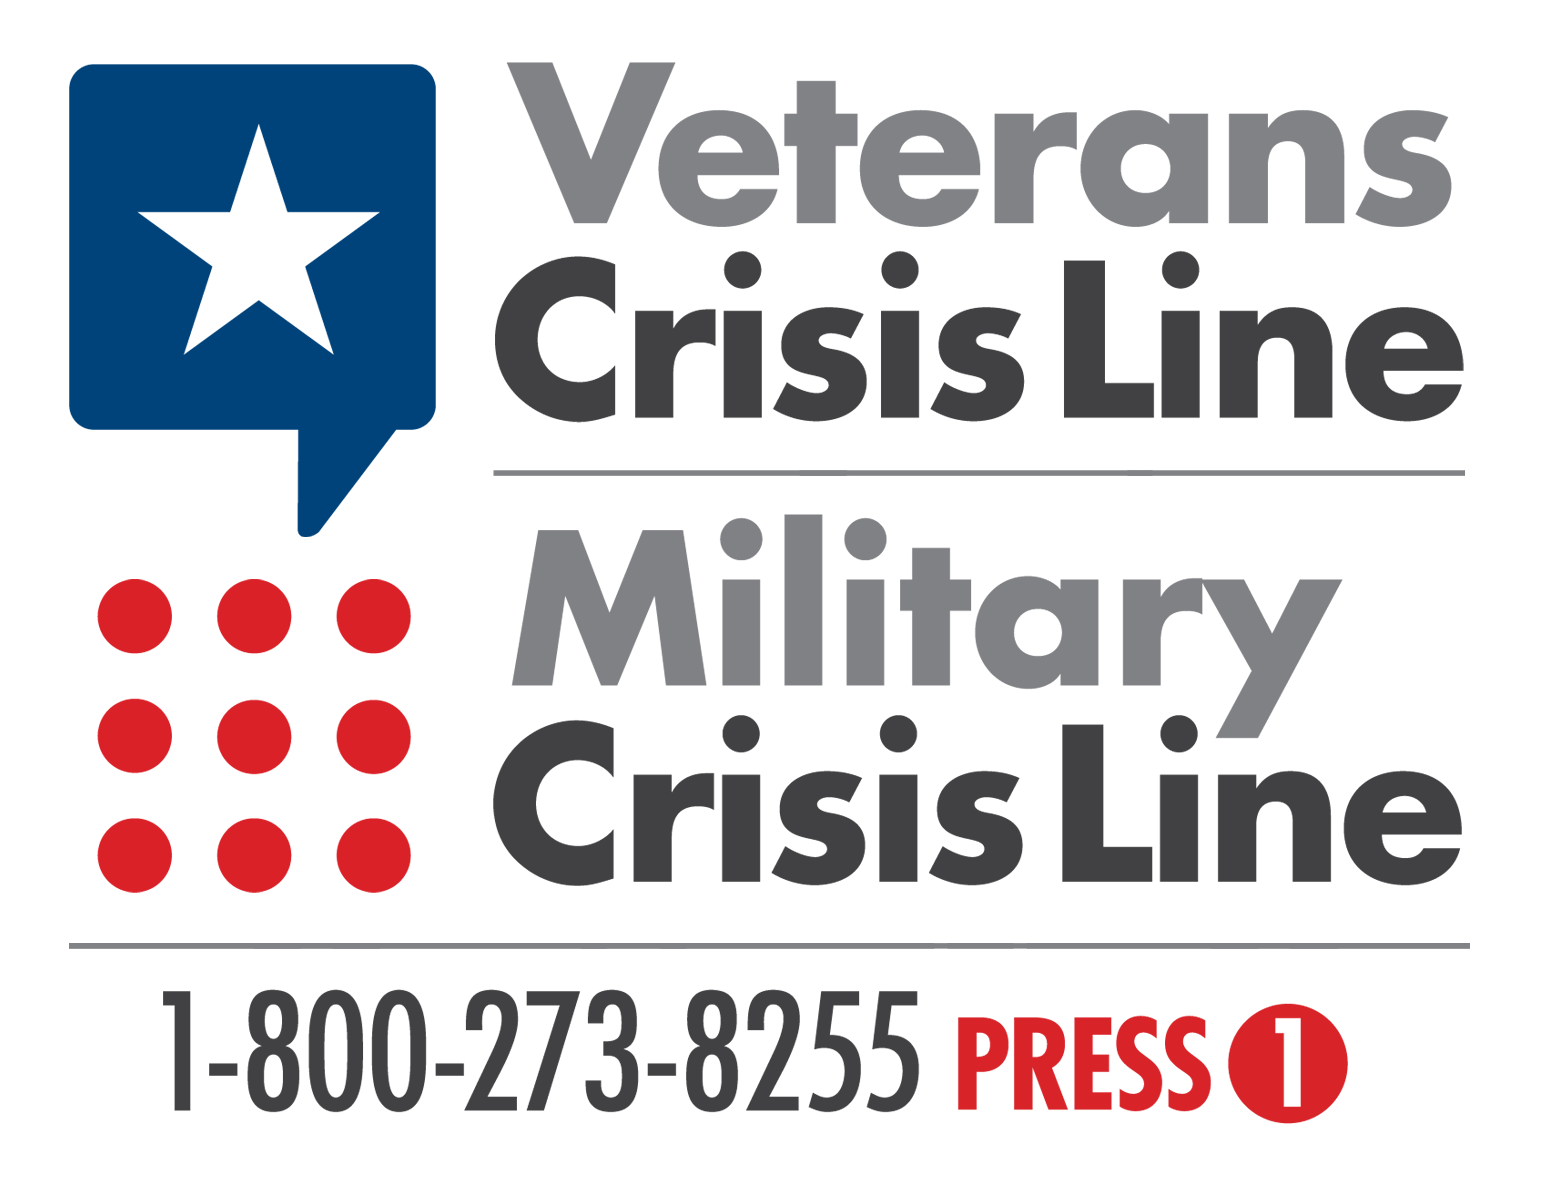 Veteran's Crisis Line